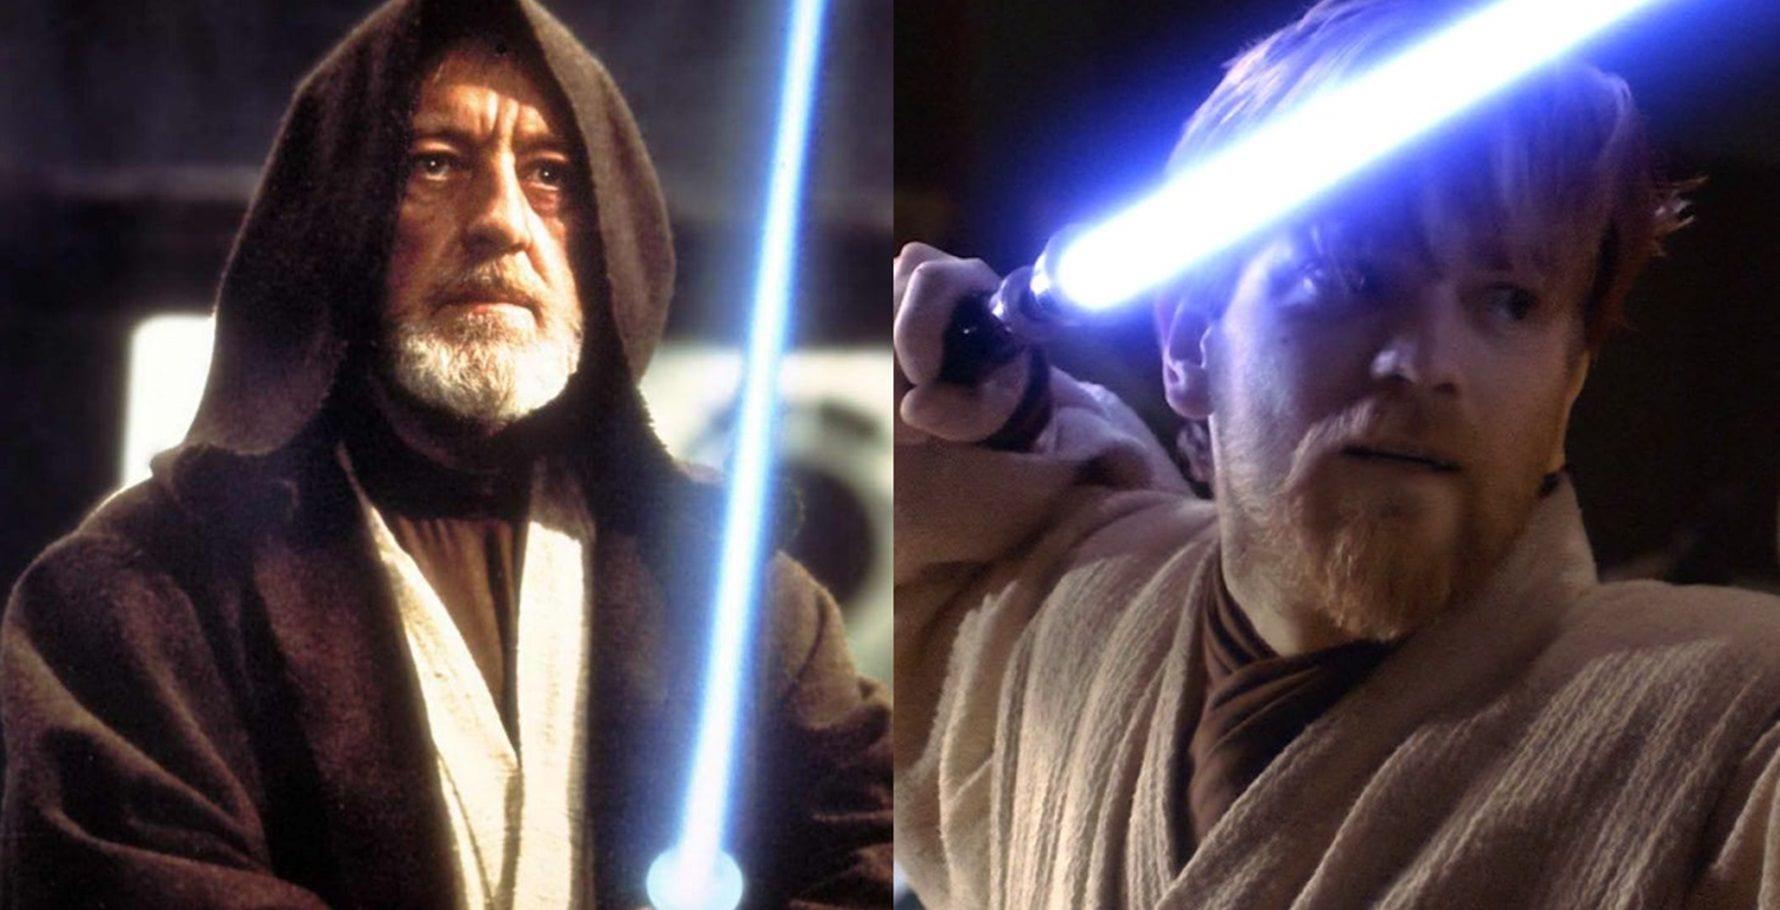 Obi Wan Kenobi: cosa cambia per Ewan McGregor ora che è più vicino all'età di Alec Guinness